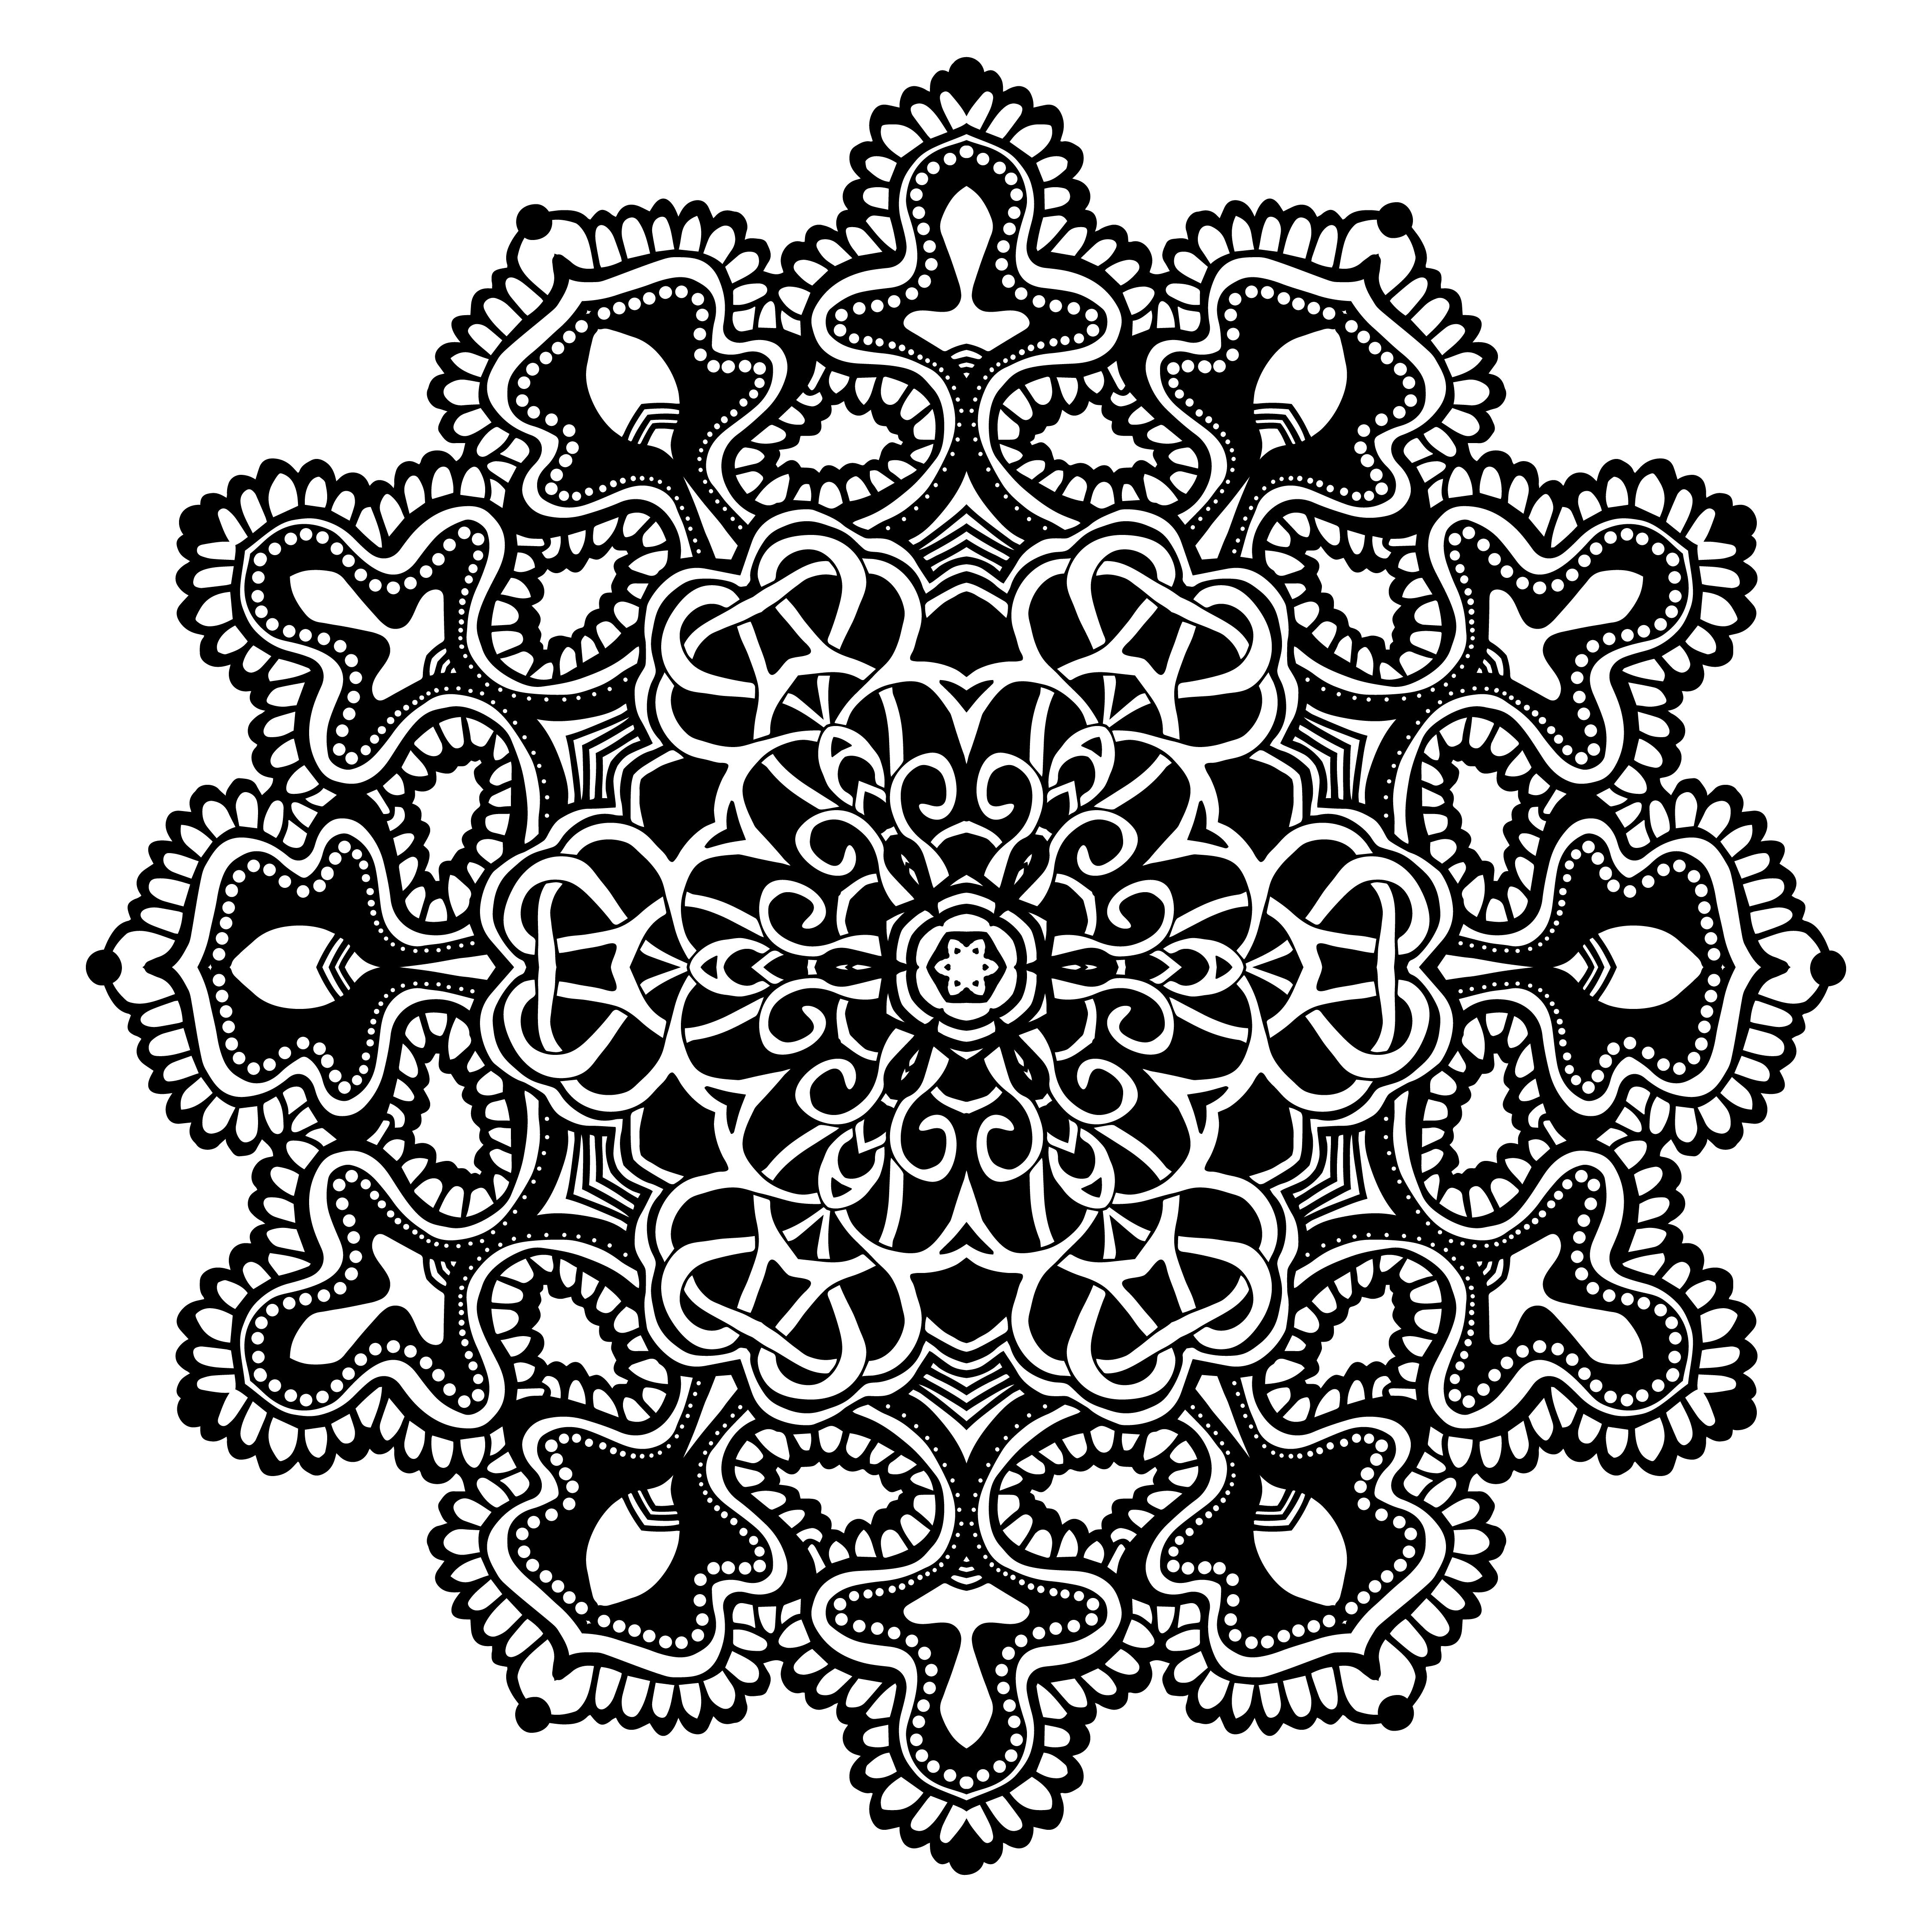 Mandala Black And White Download Free Vectors Clipart